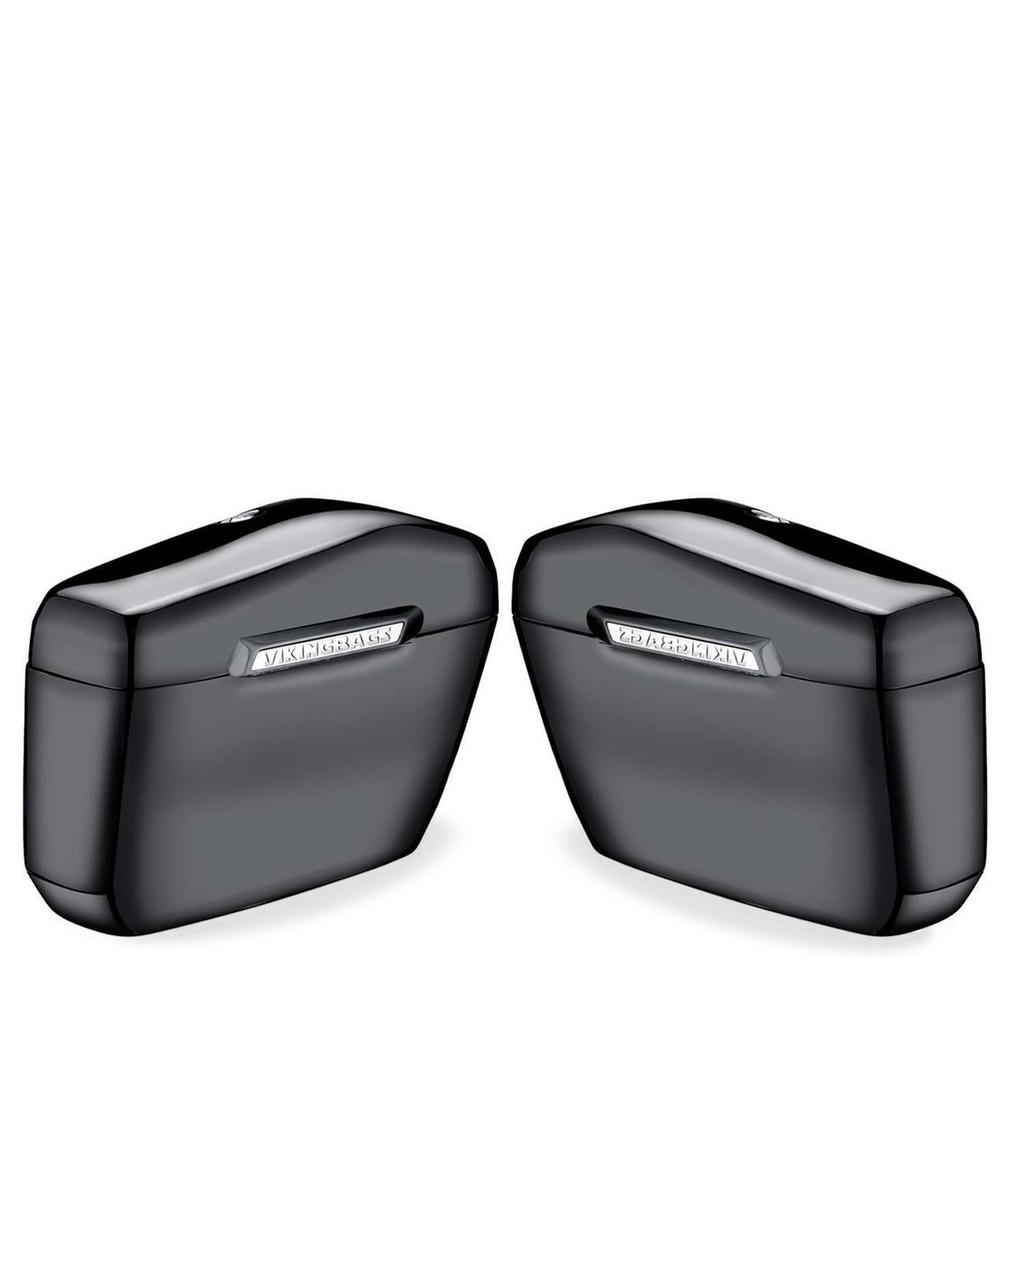 Yamaha Silverado Viking Lamellar Extra Large Black Hard Saddlebags Both Bags View